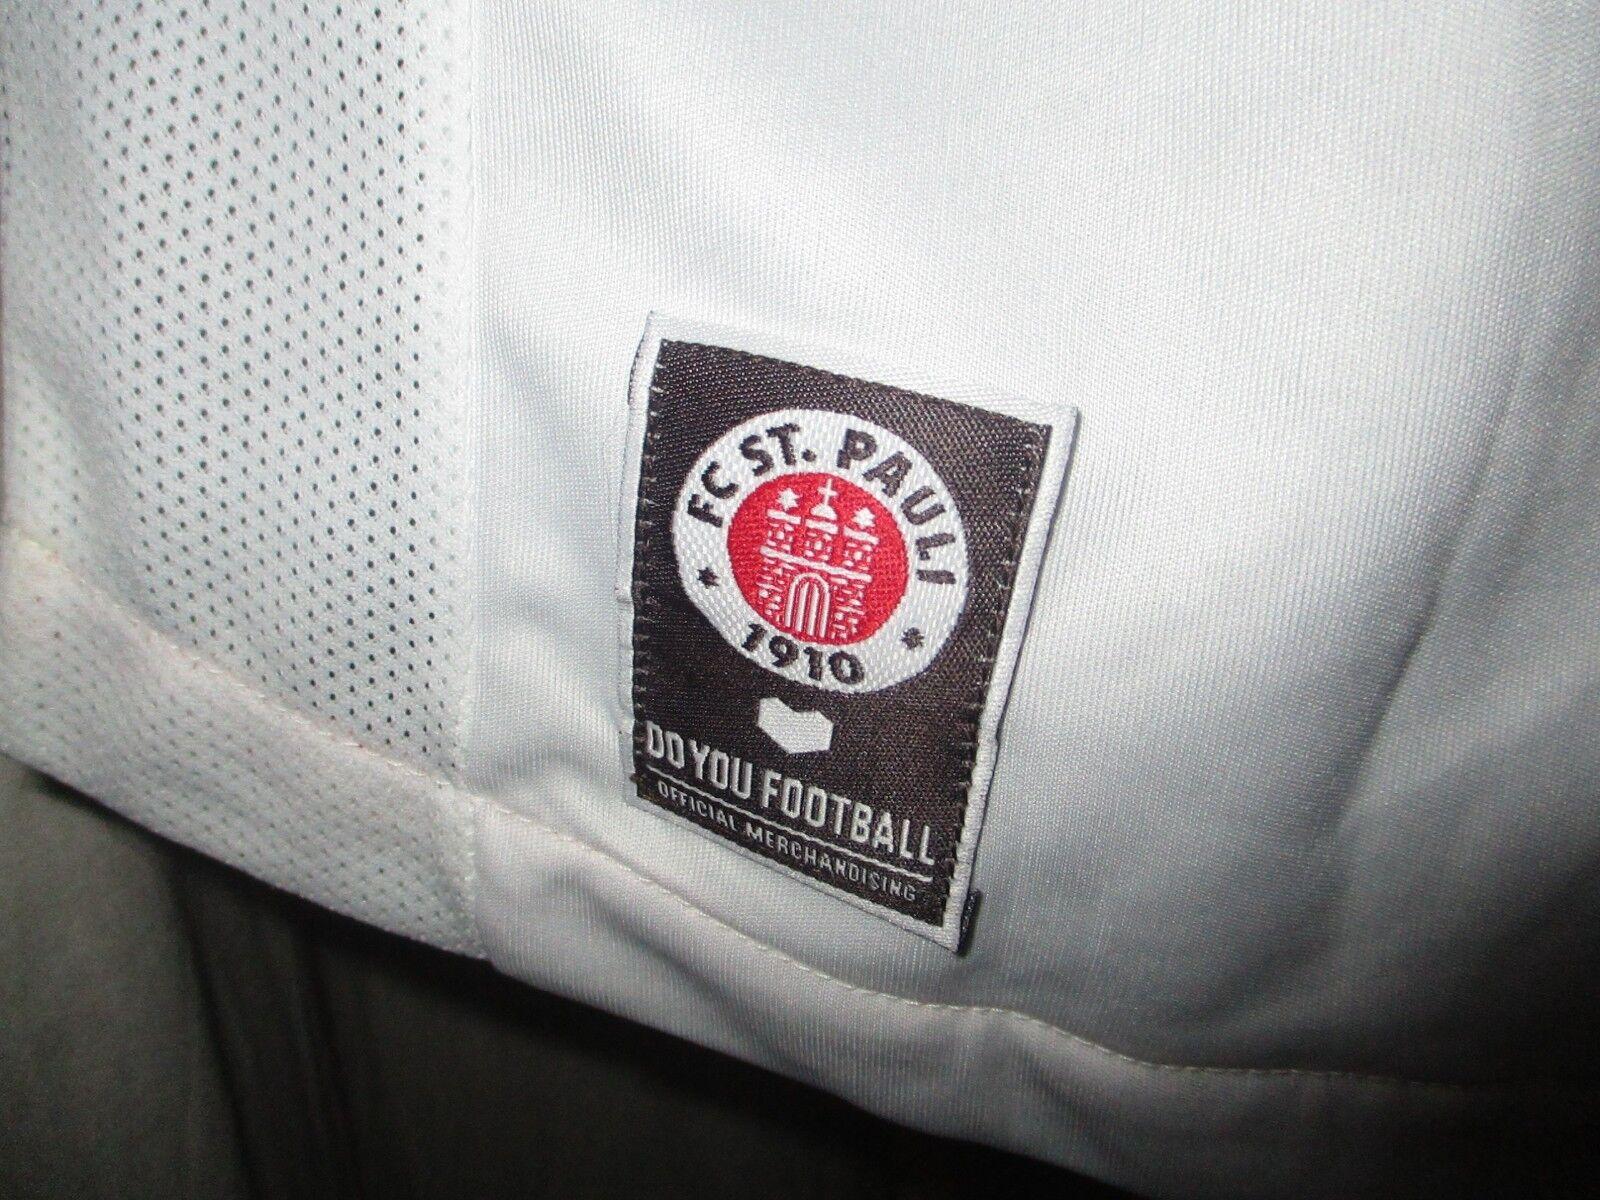 FC St.Pauli DoYou Football Football Football Auswärts Matchworn Trikot 12 13 + Nr.7 Daube Gr.L TOP  | Angemessener Preis  8e3353